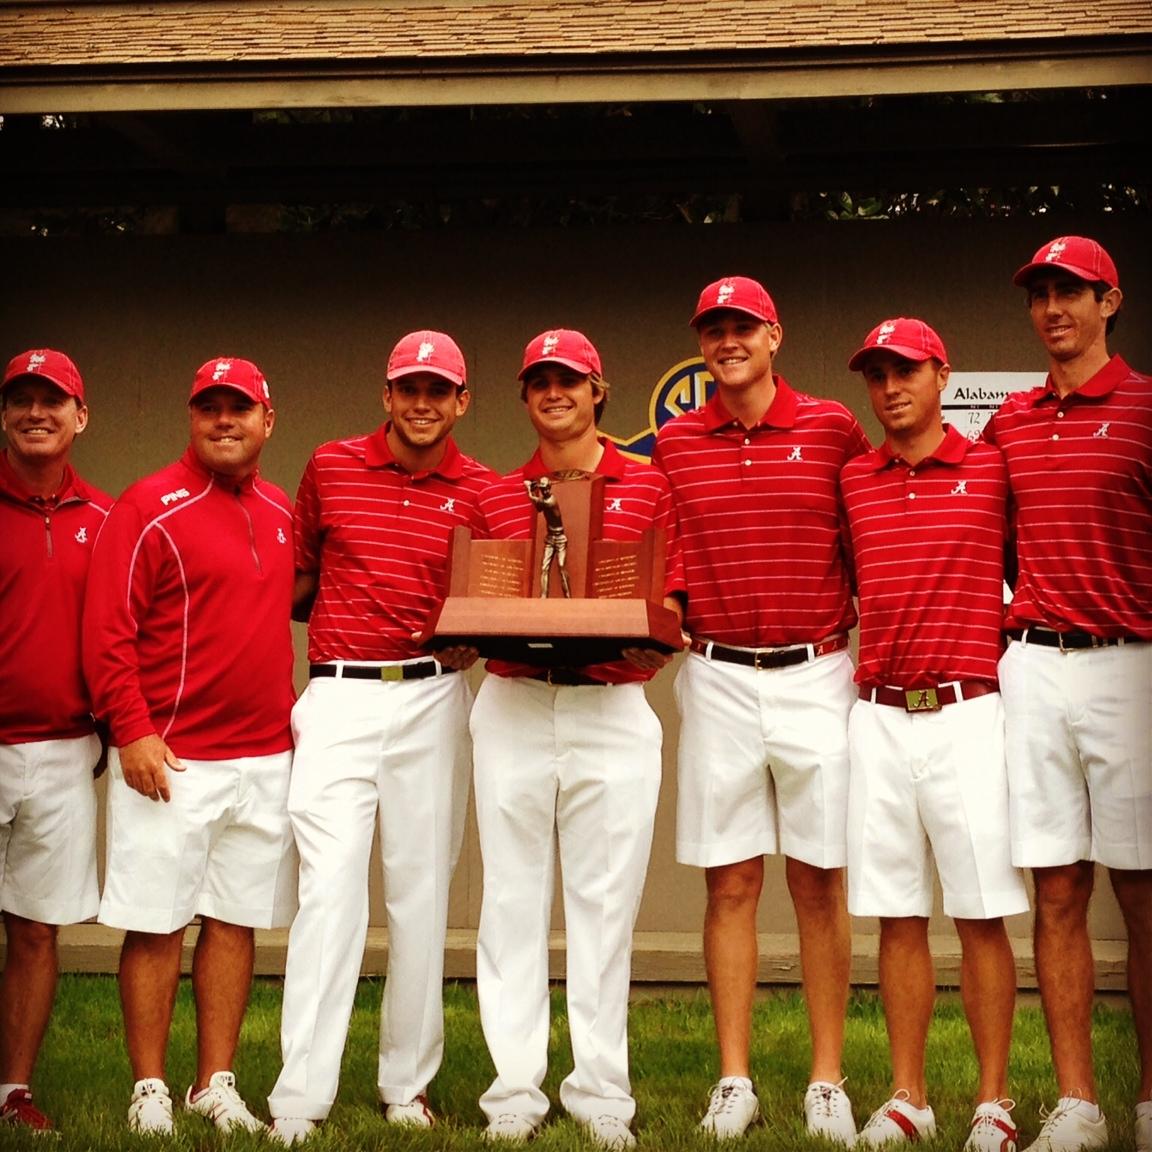 SEC Champions, the Alabama Crimson Tide